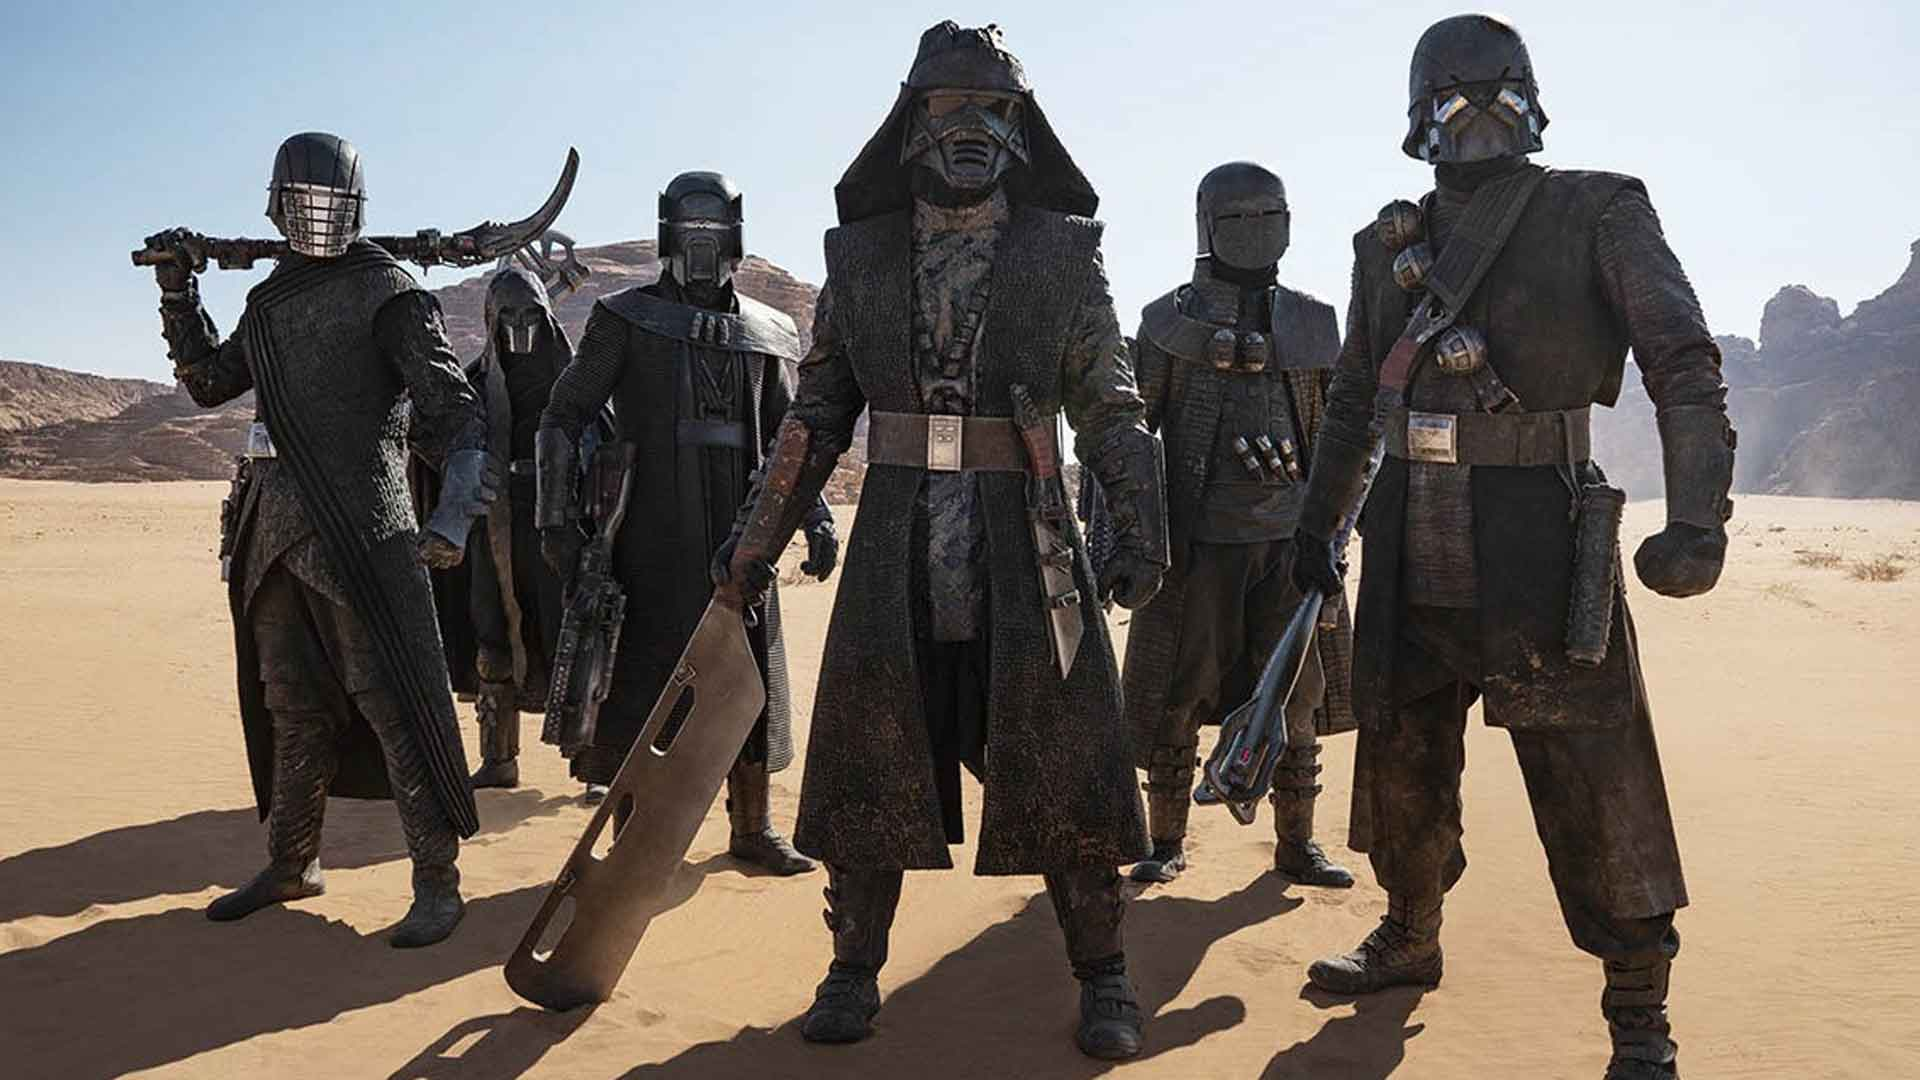 Eunice Huthart Star Wars: The Rise of Skywalker stunts